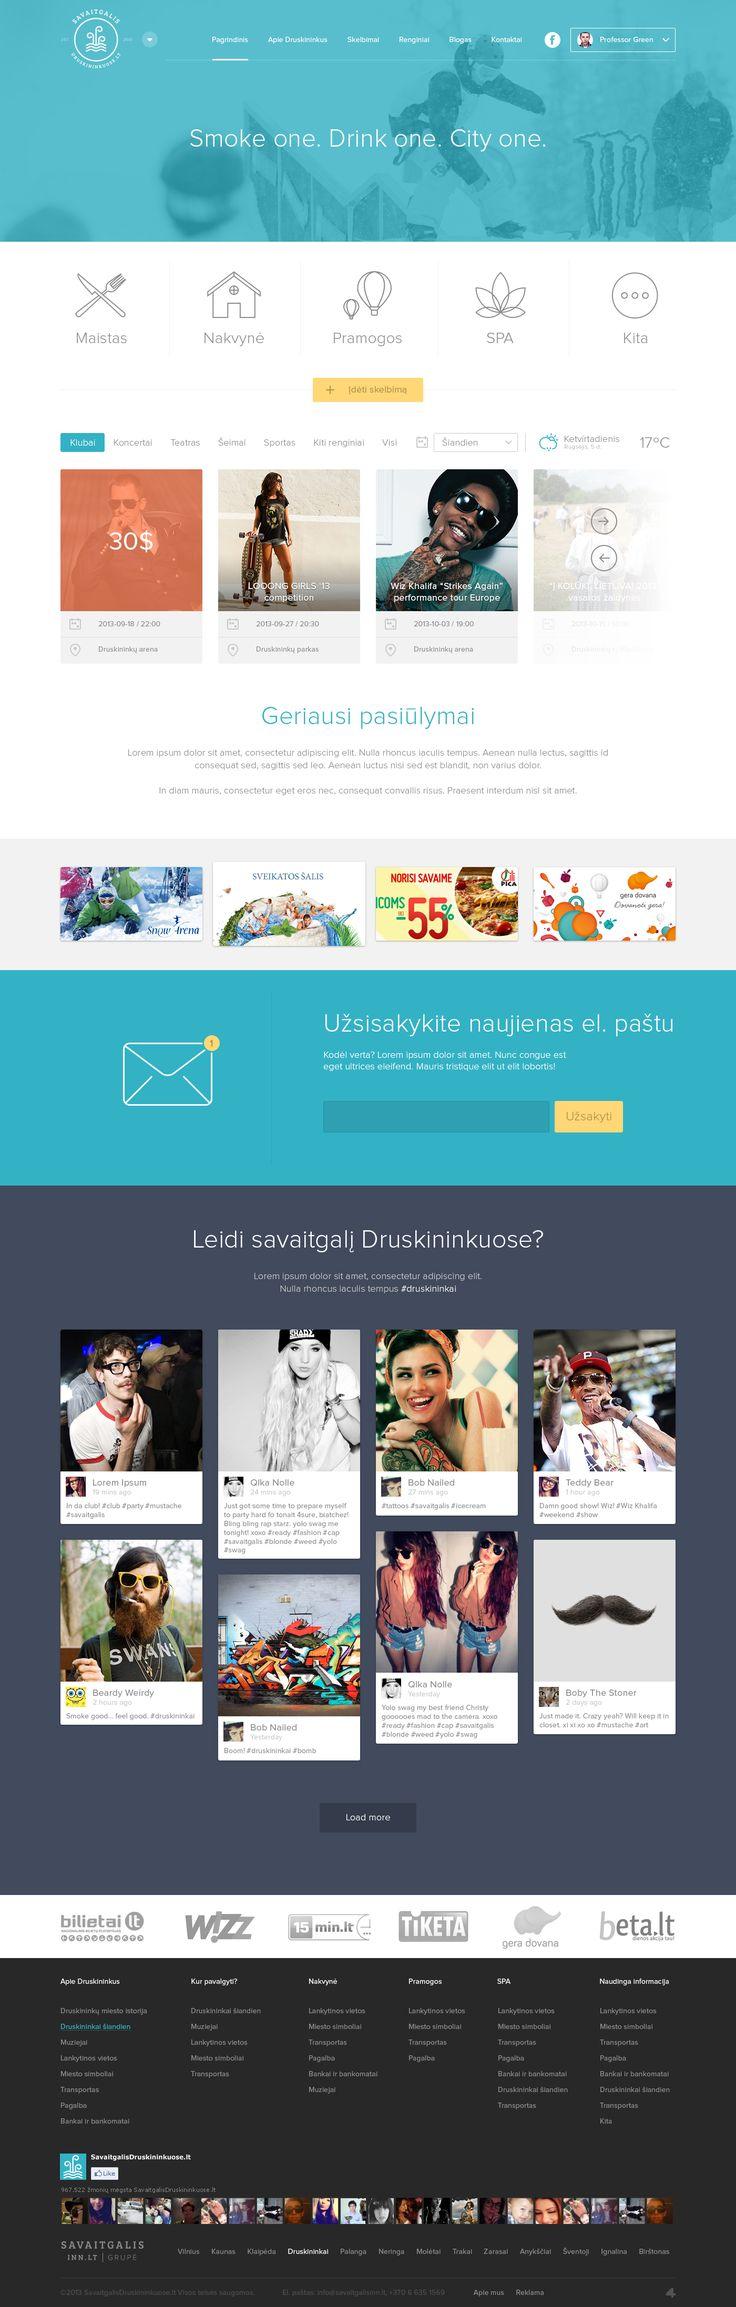 Use cards like we do on the web concept Savaitgalis Druskininkuose landing page